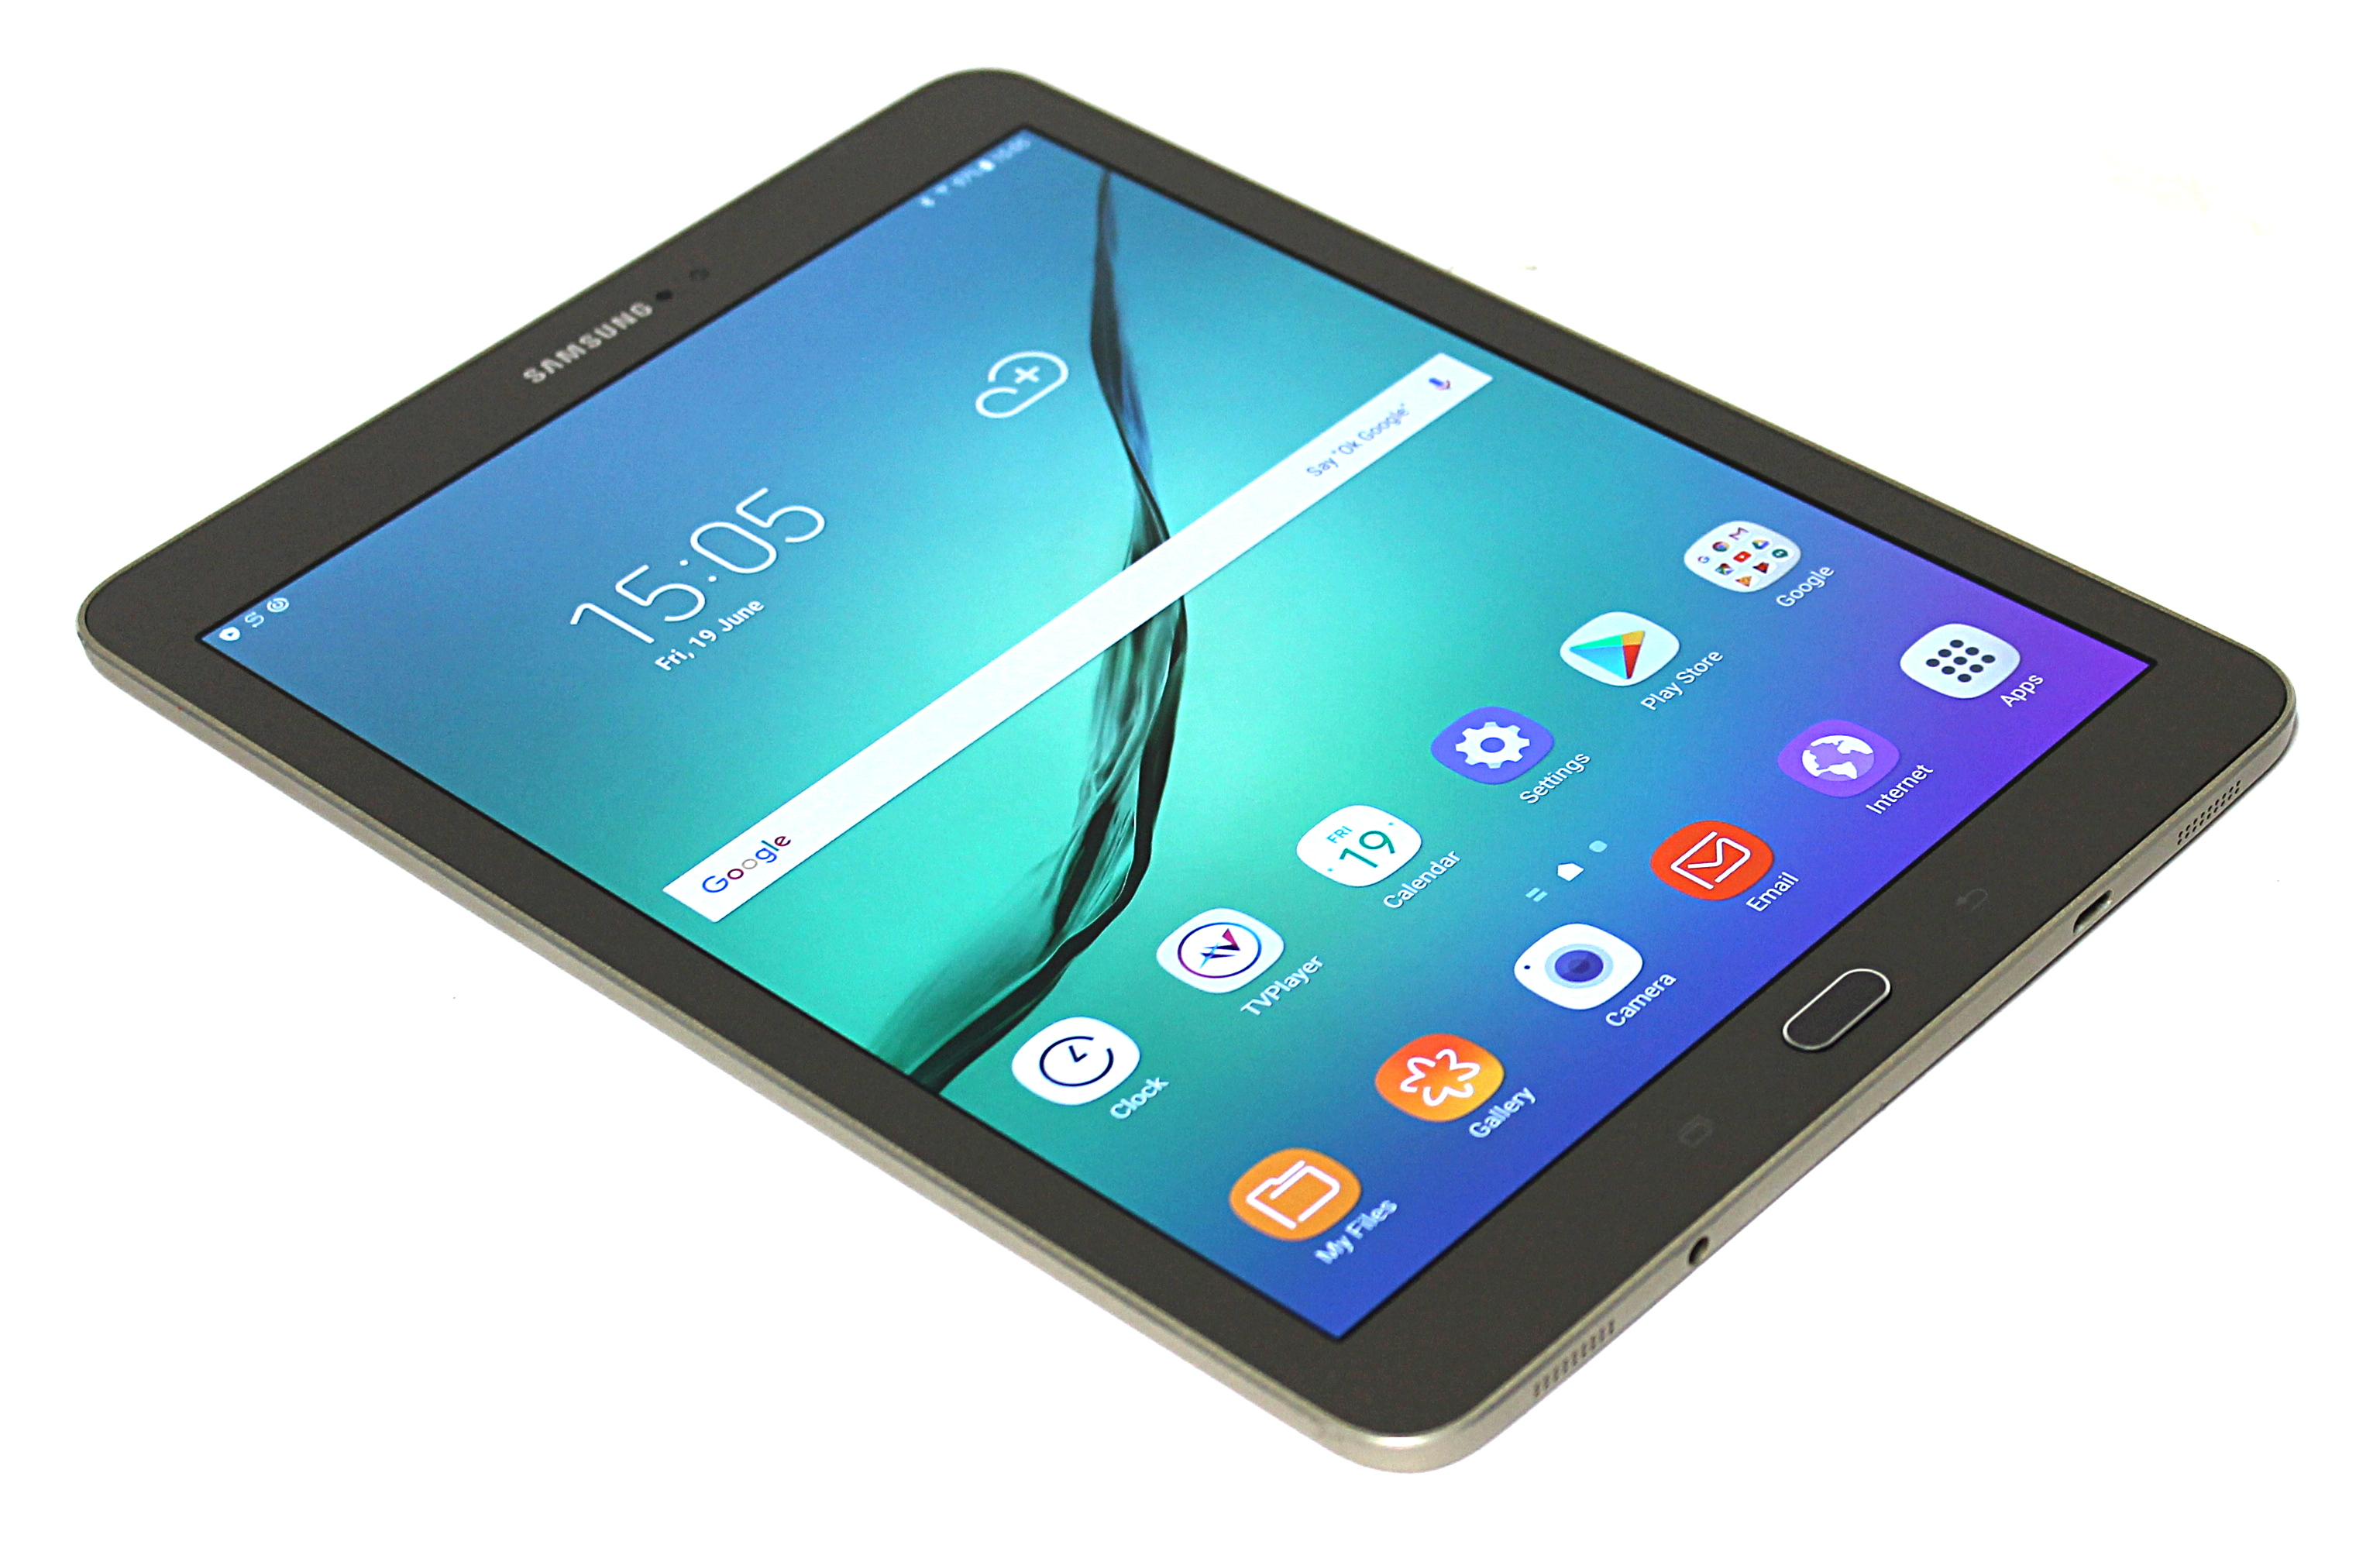 Samsung Galaxy Tab S2 9.7 (2016) SM-T813 - 32GB Gold